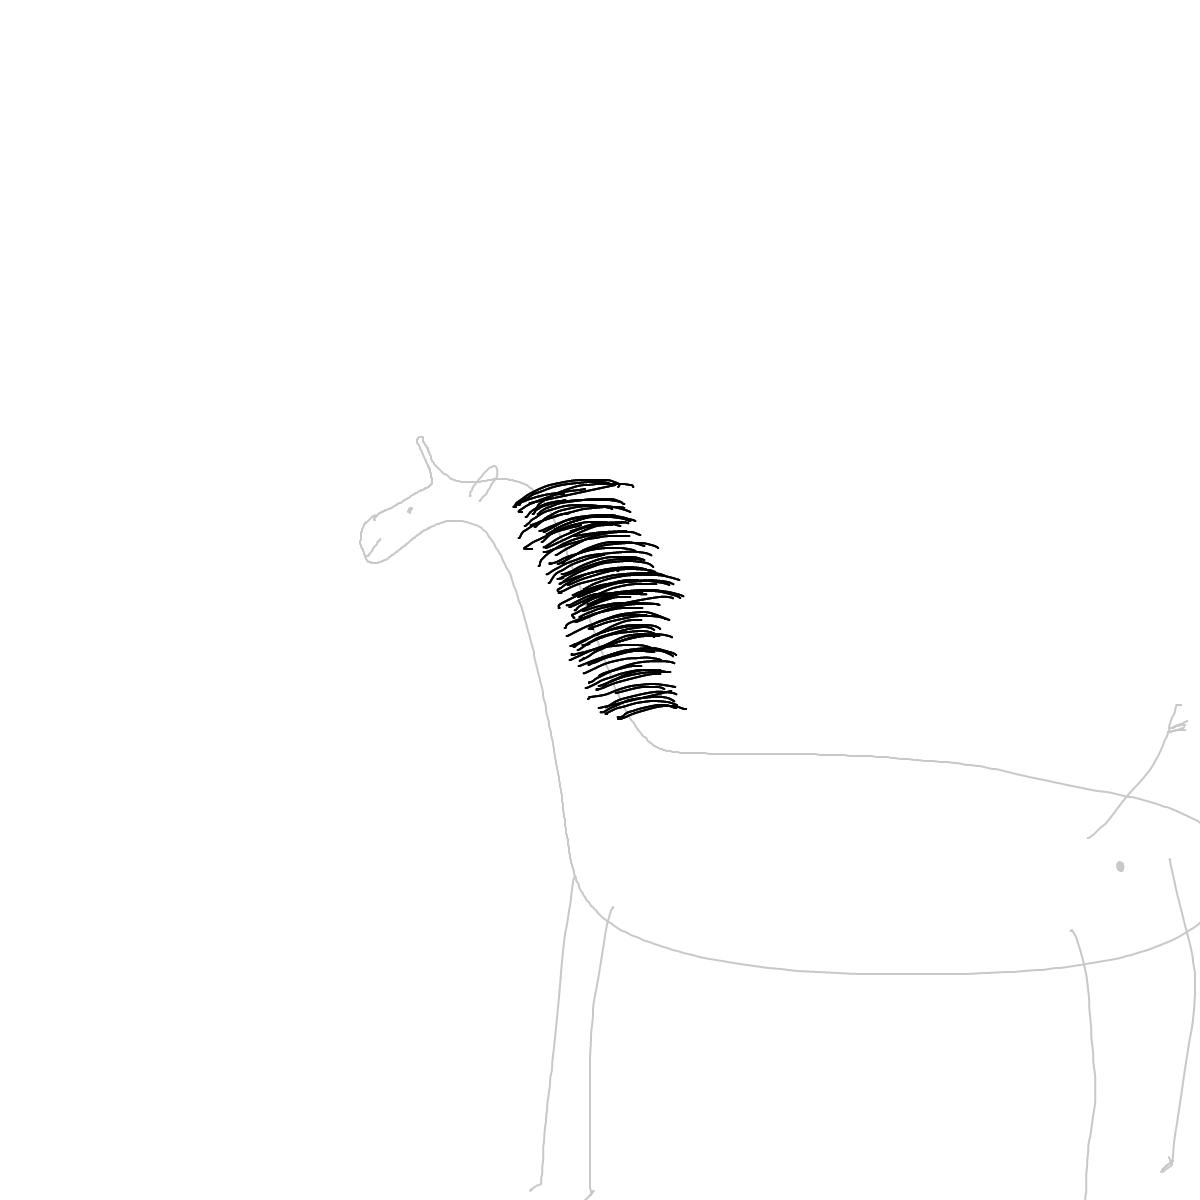 BAAAM drawing#5919 lat:52.4749221801757800lng: 13.4073419570922850